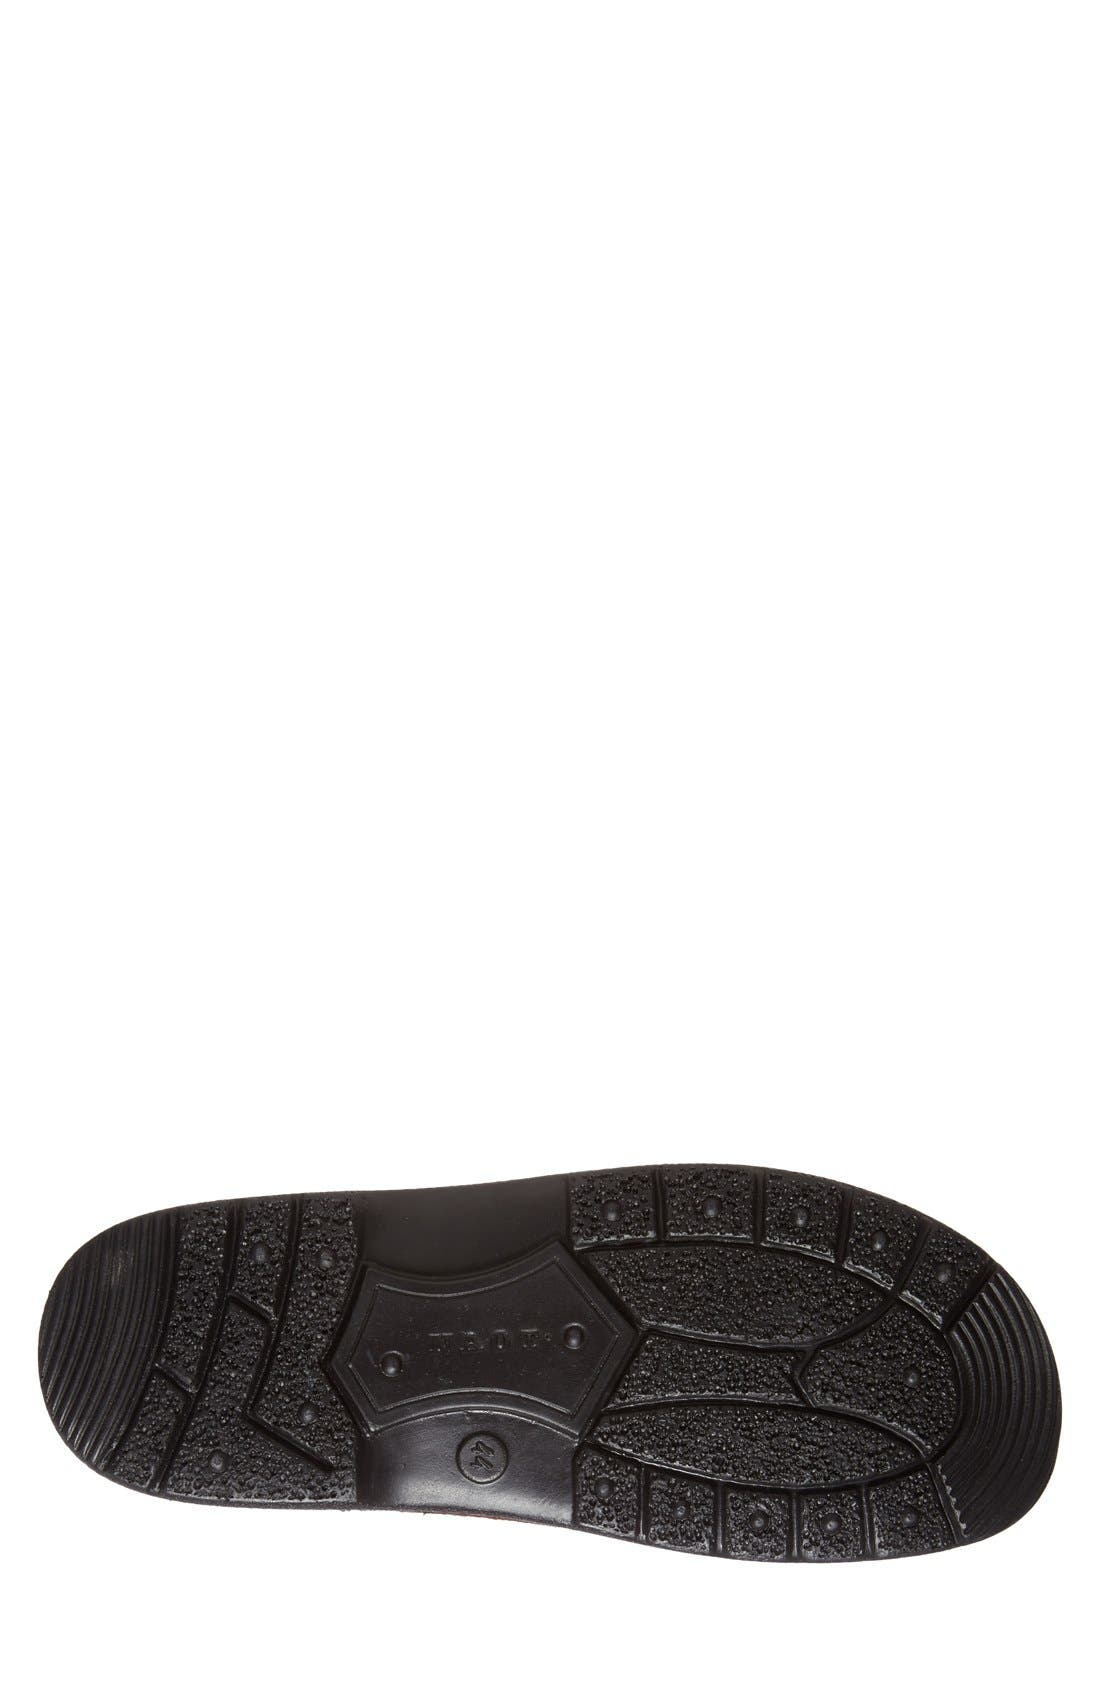 Denali Plain Toe Derby,                             Alternate thumbnail 4, color,                             Brown Leather